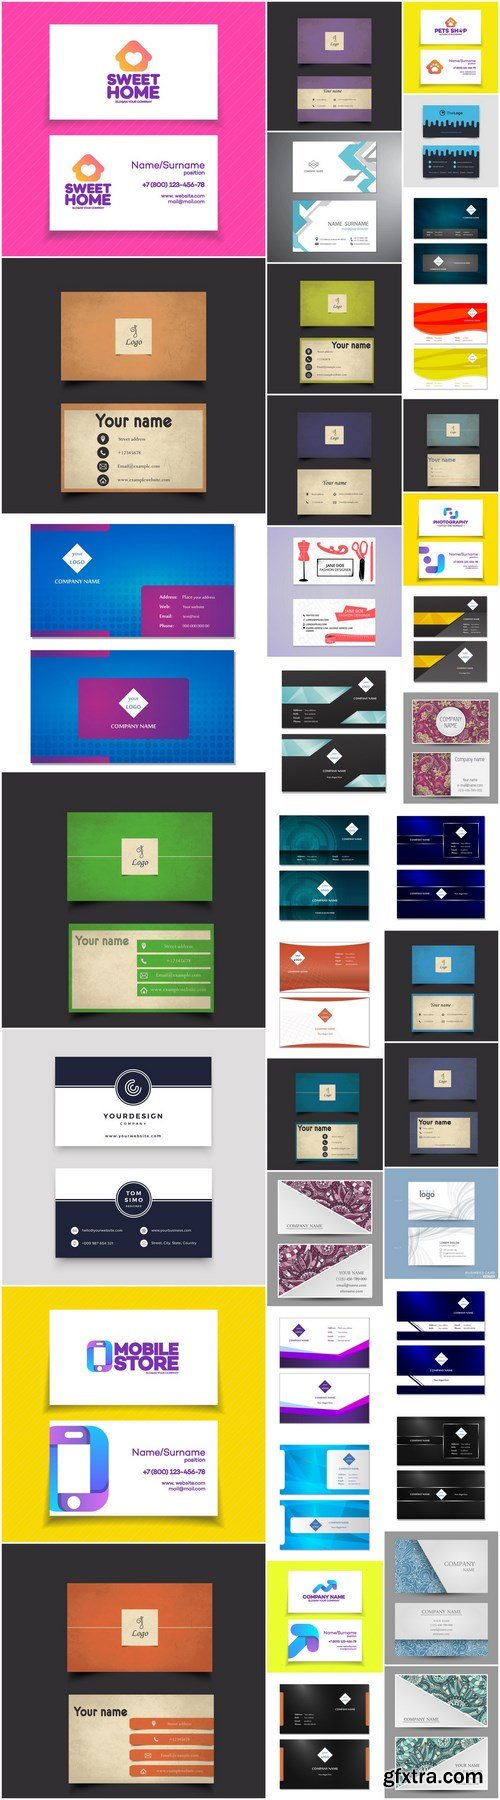 Business Card Design #148 - 38 Vector